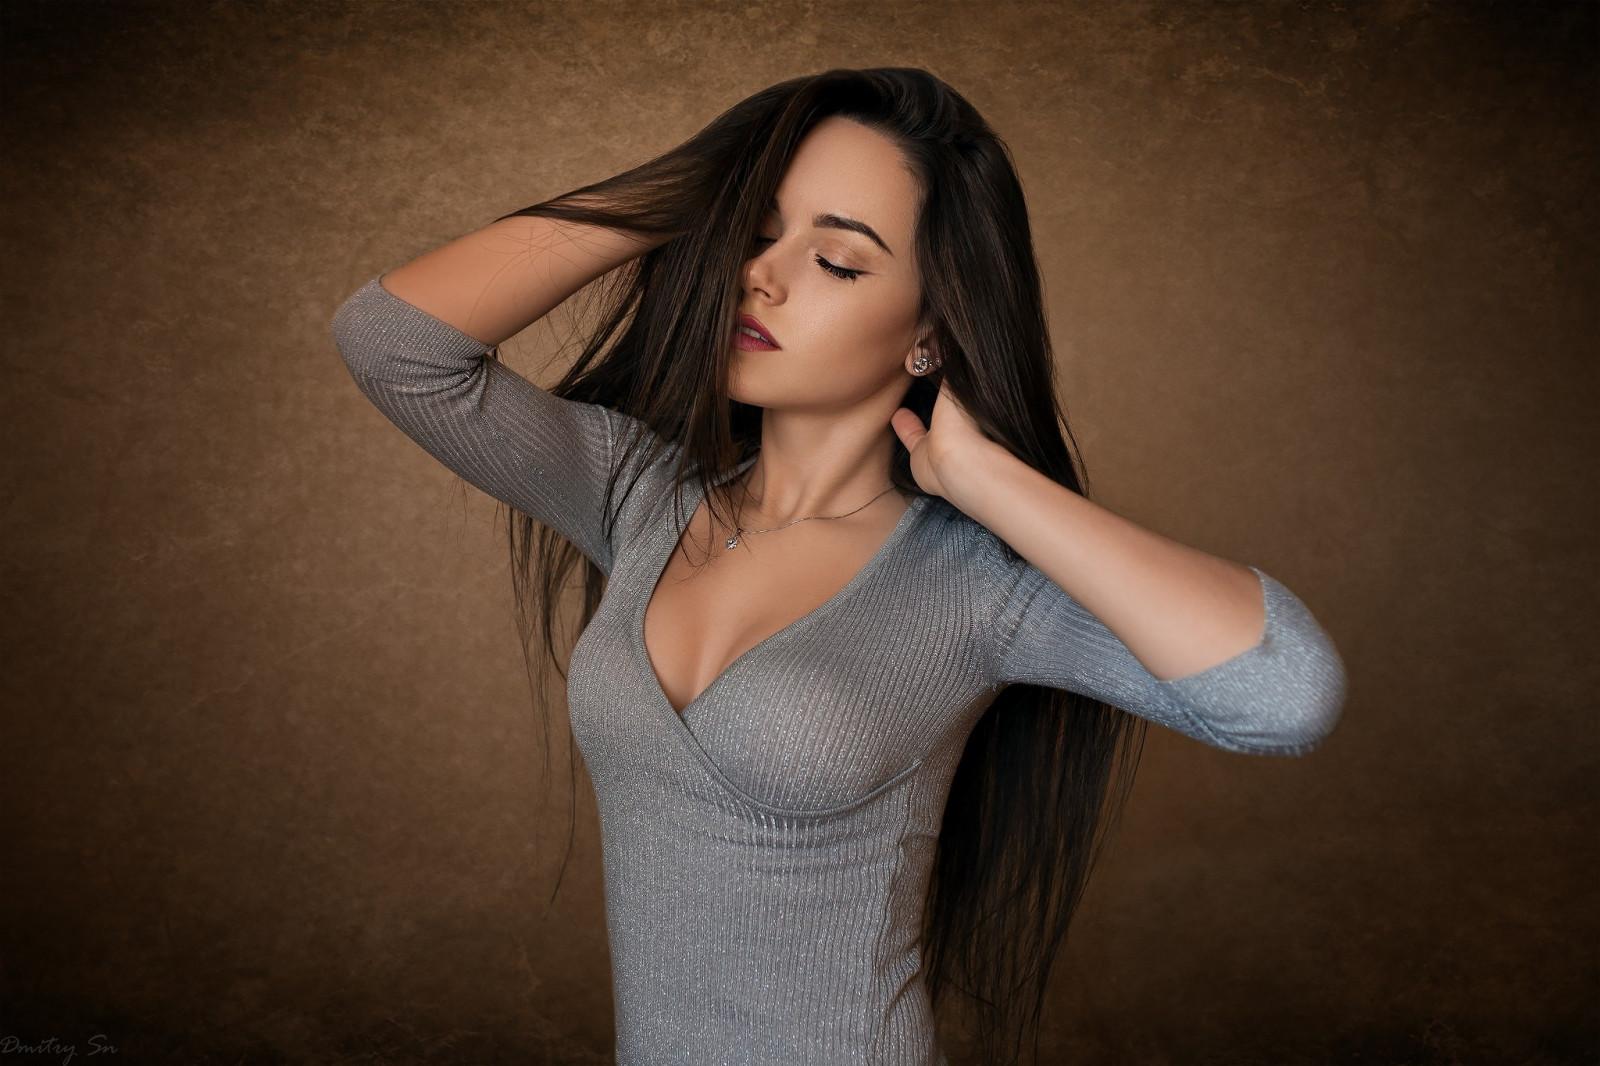 Wallpaper : face, women, simple background, long hair ...